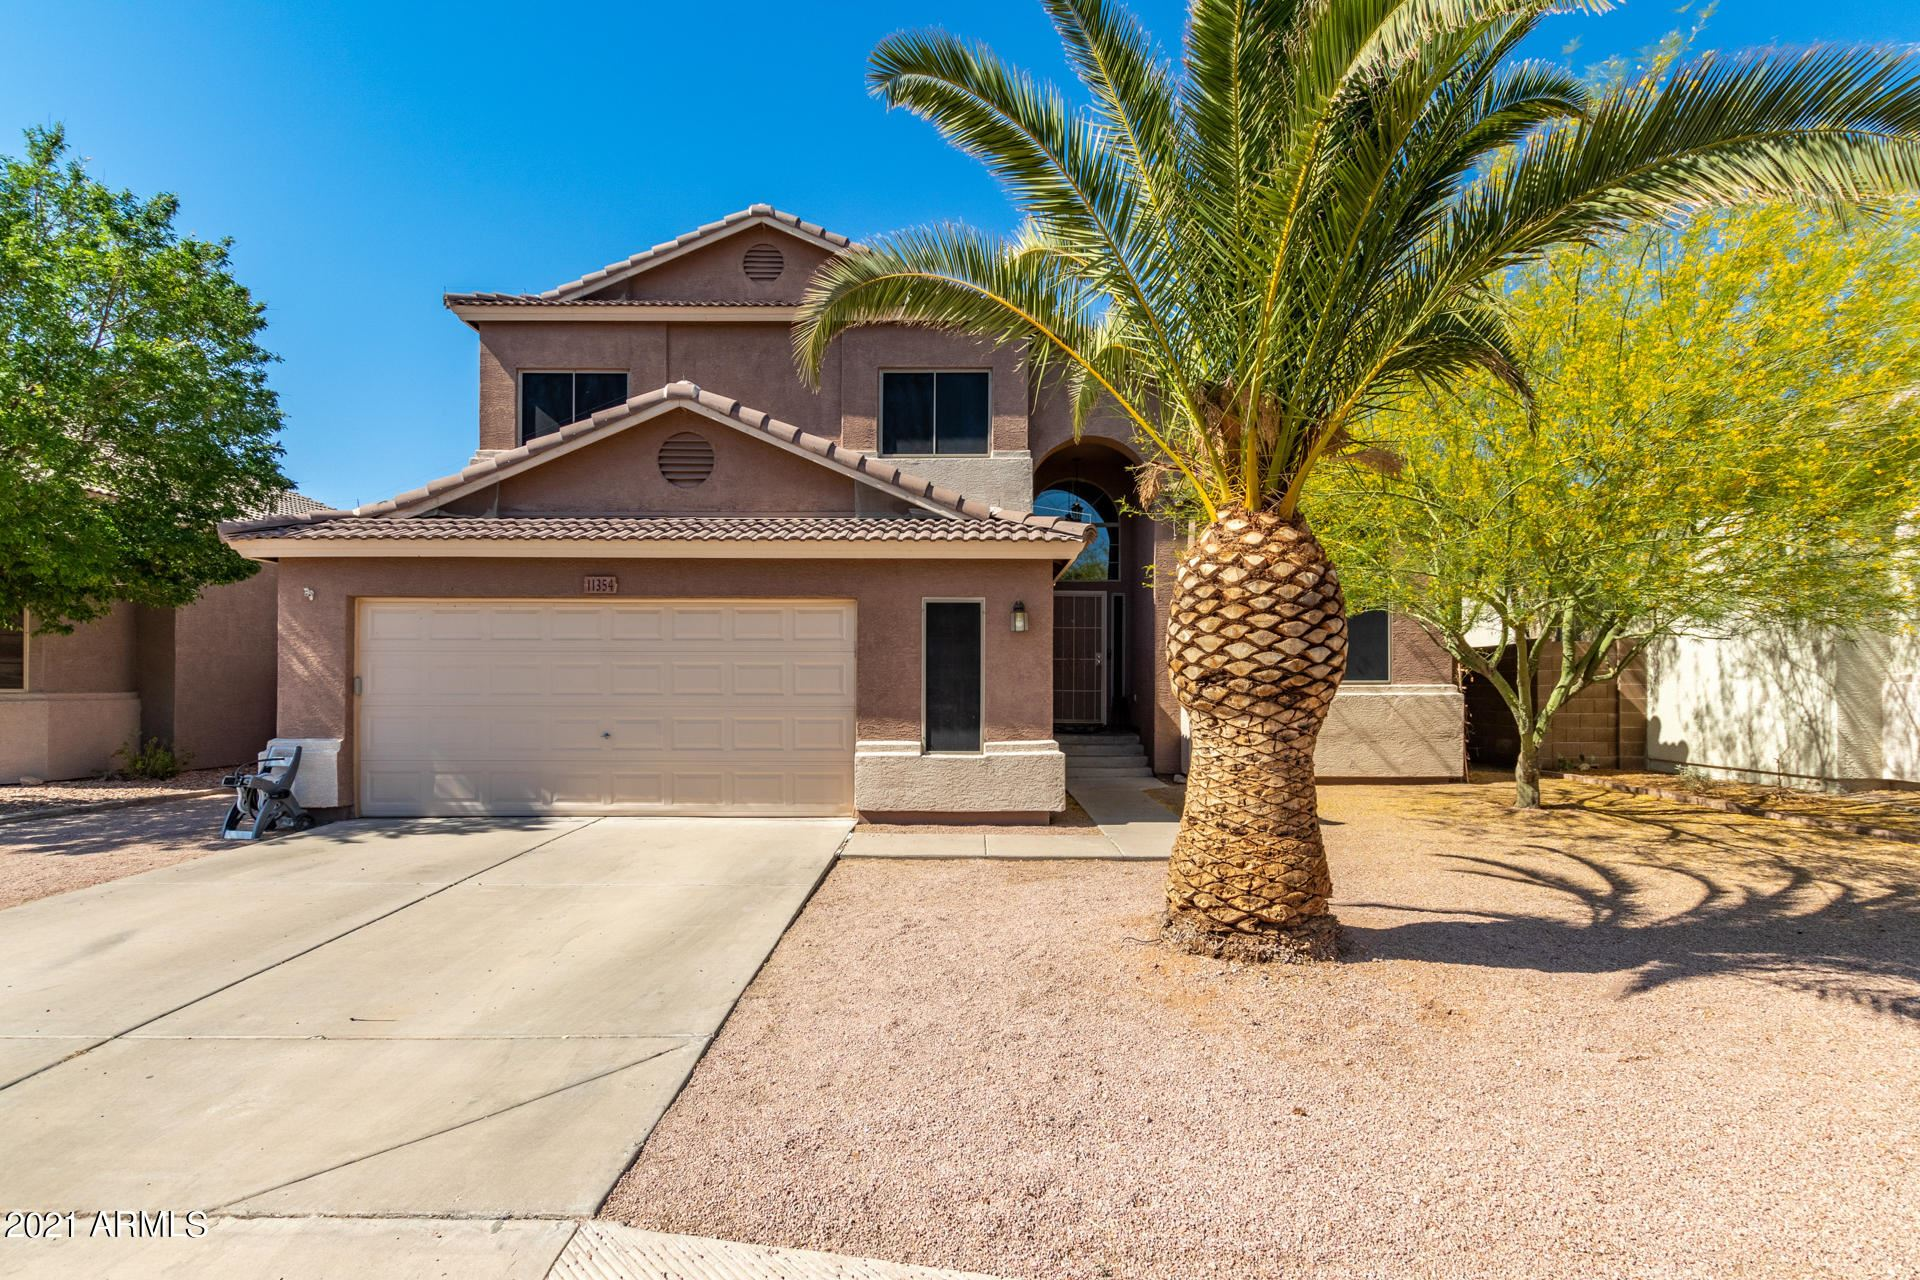 11354 E COVINA Street, Mesa, AZ 85207 - MLS#: 6231932